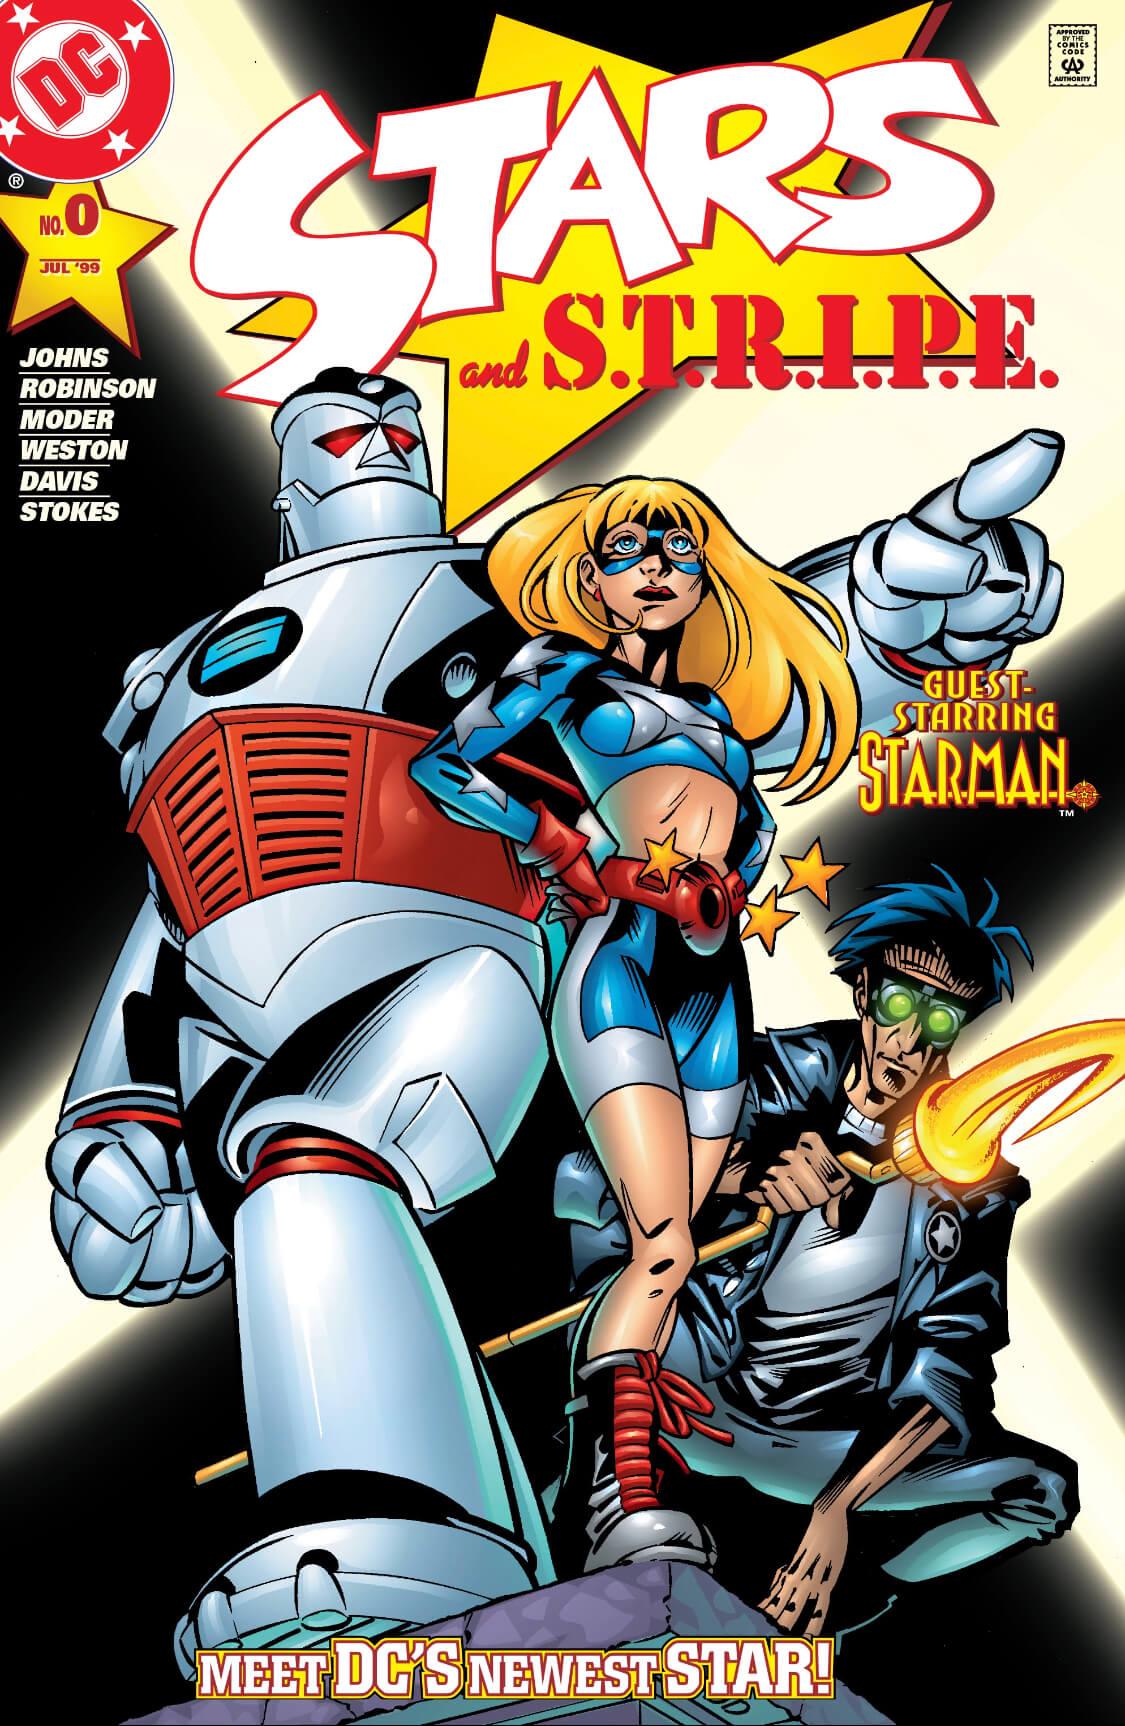 Stars-and-Stripe-DC-Comics-Geoff-Johns.jpg